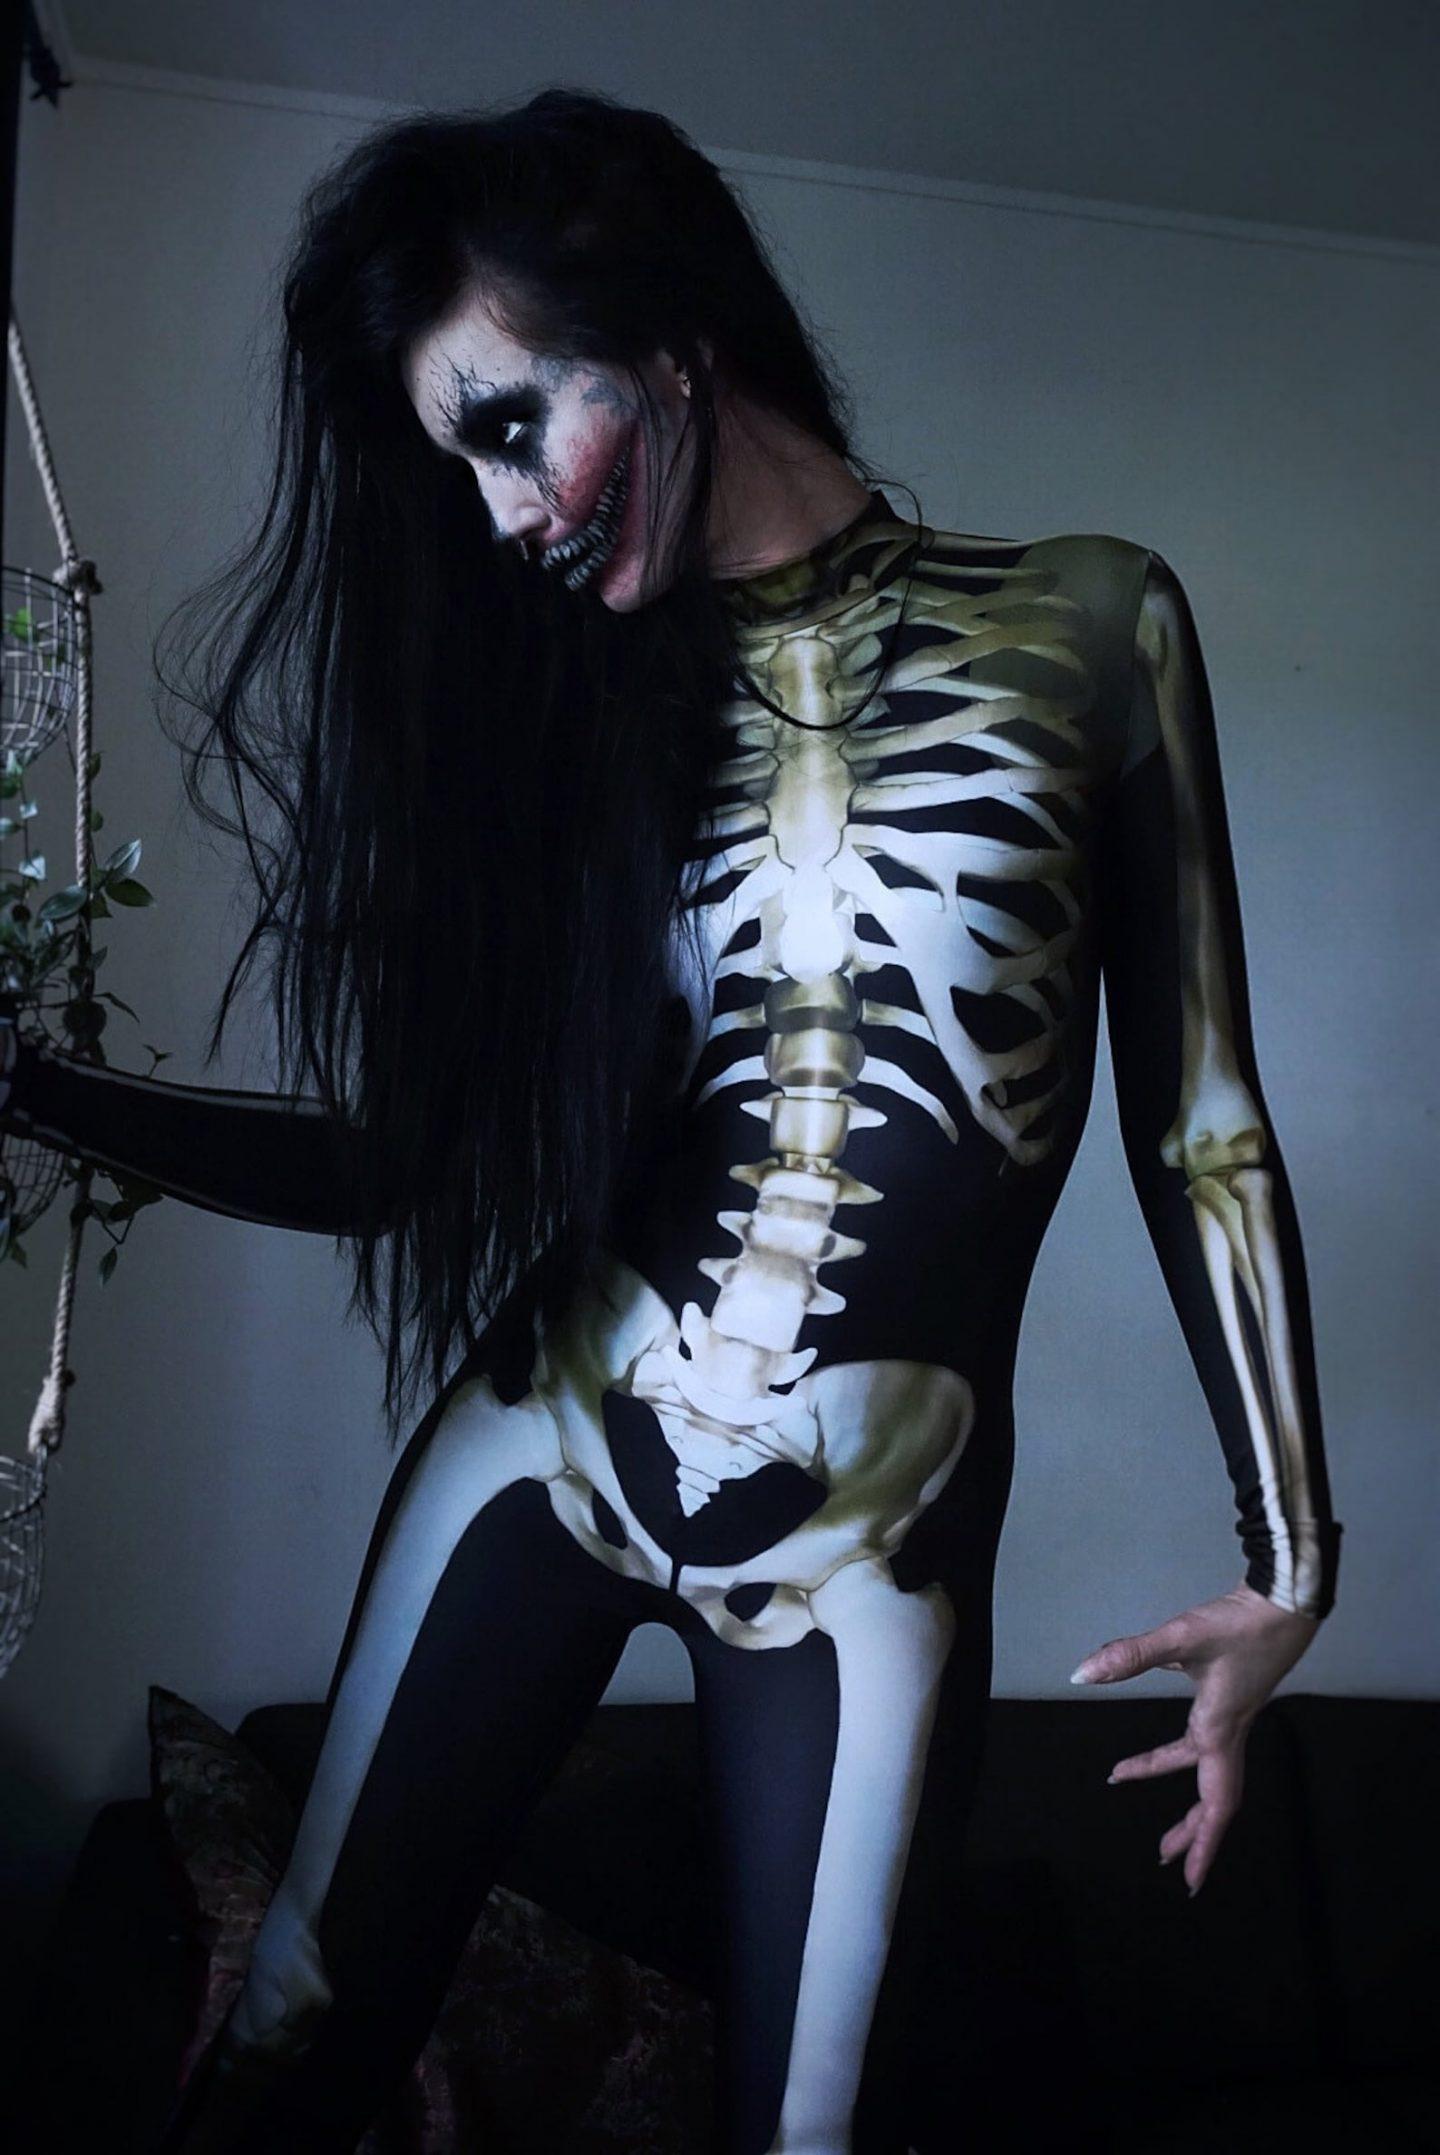 Scary skeleton Halloween costume